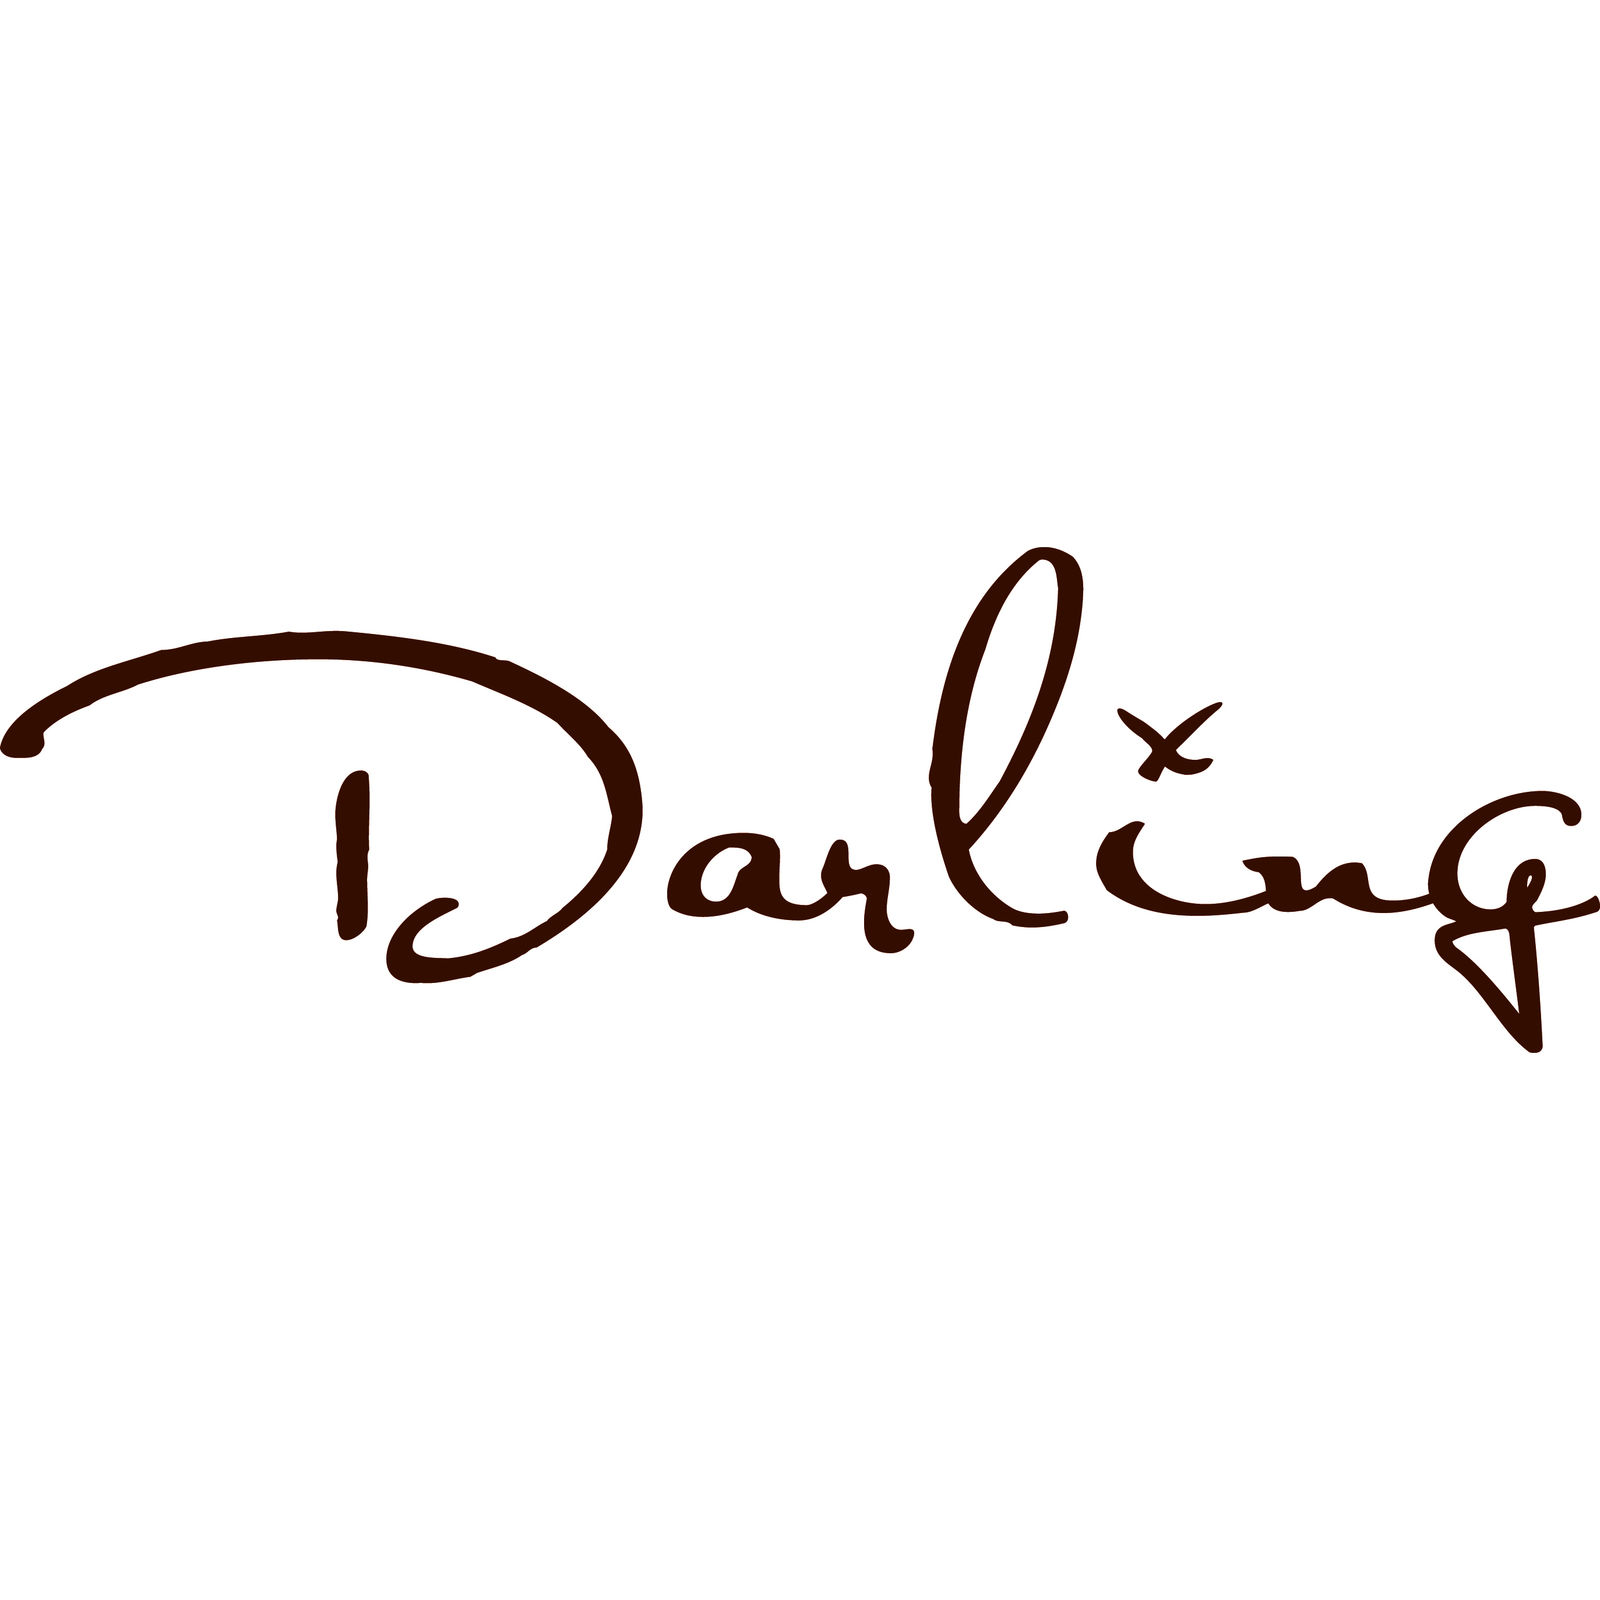 Darling (Bild 1)